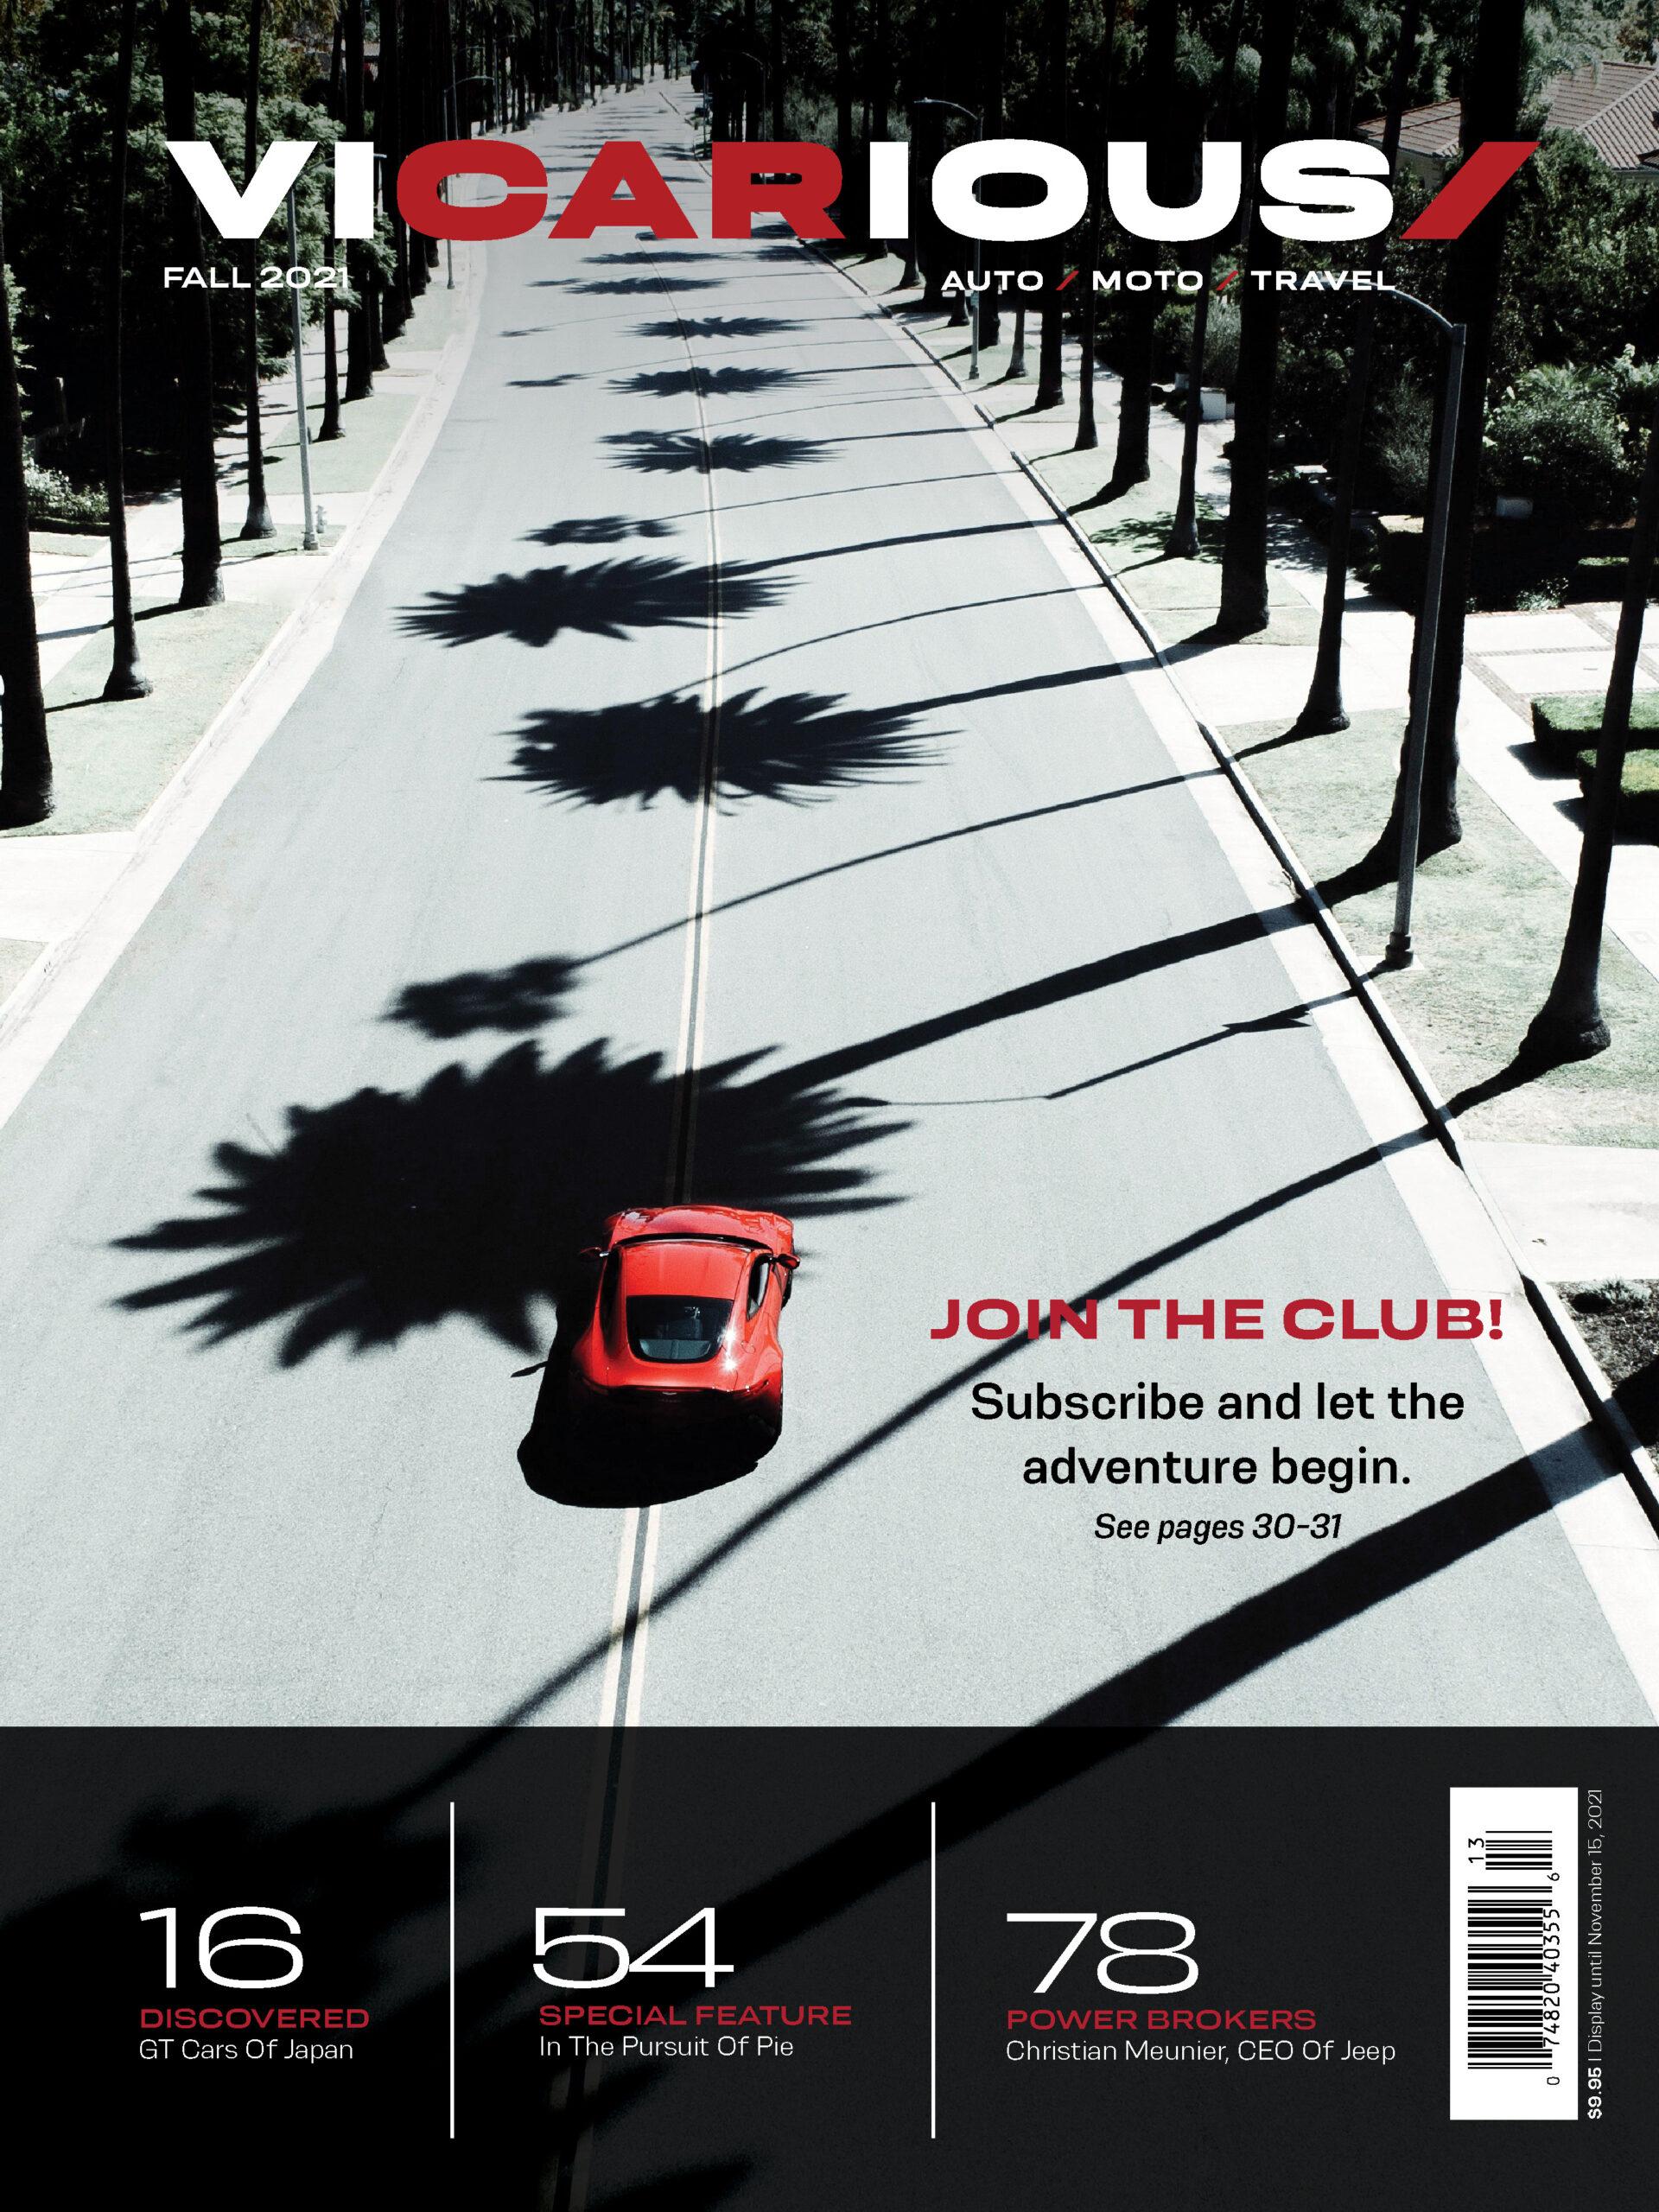 Vicarious Magazine